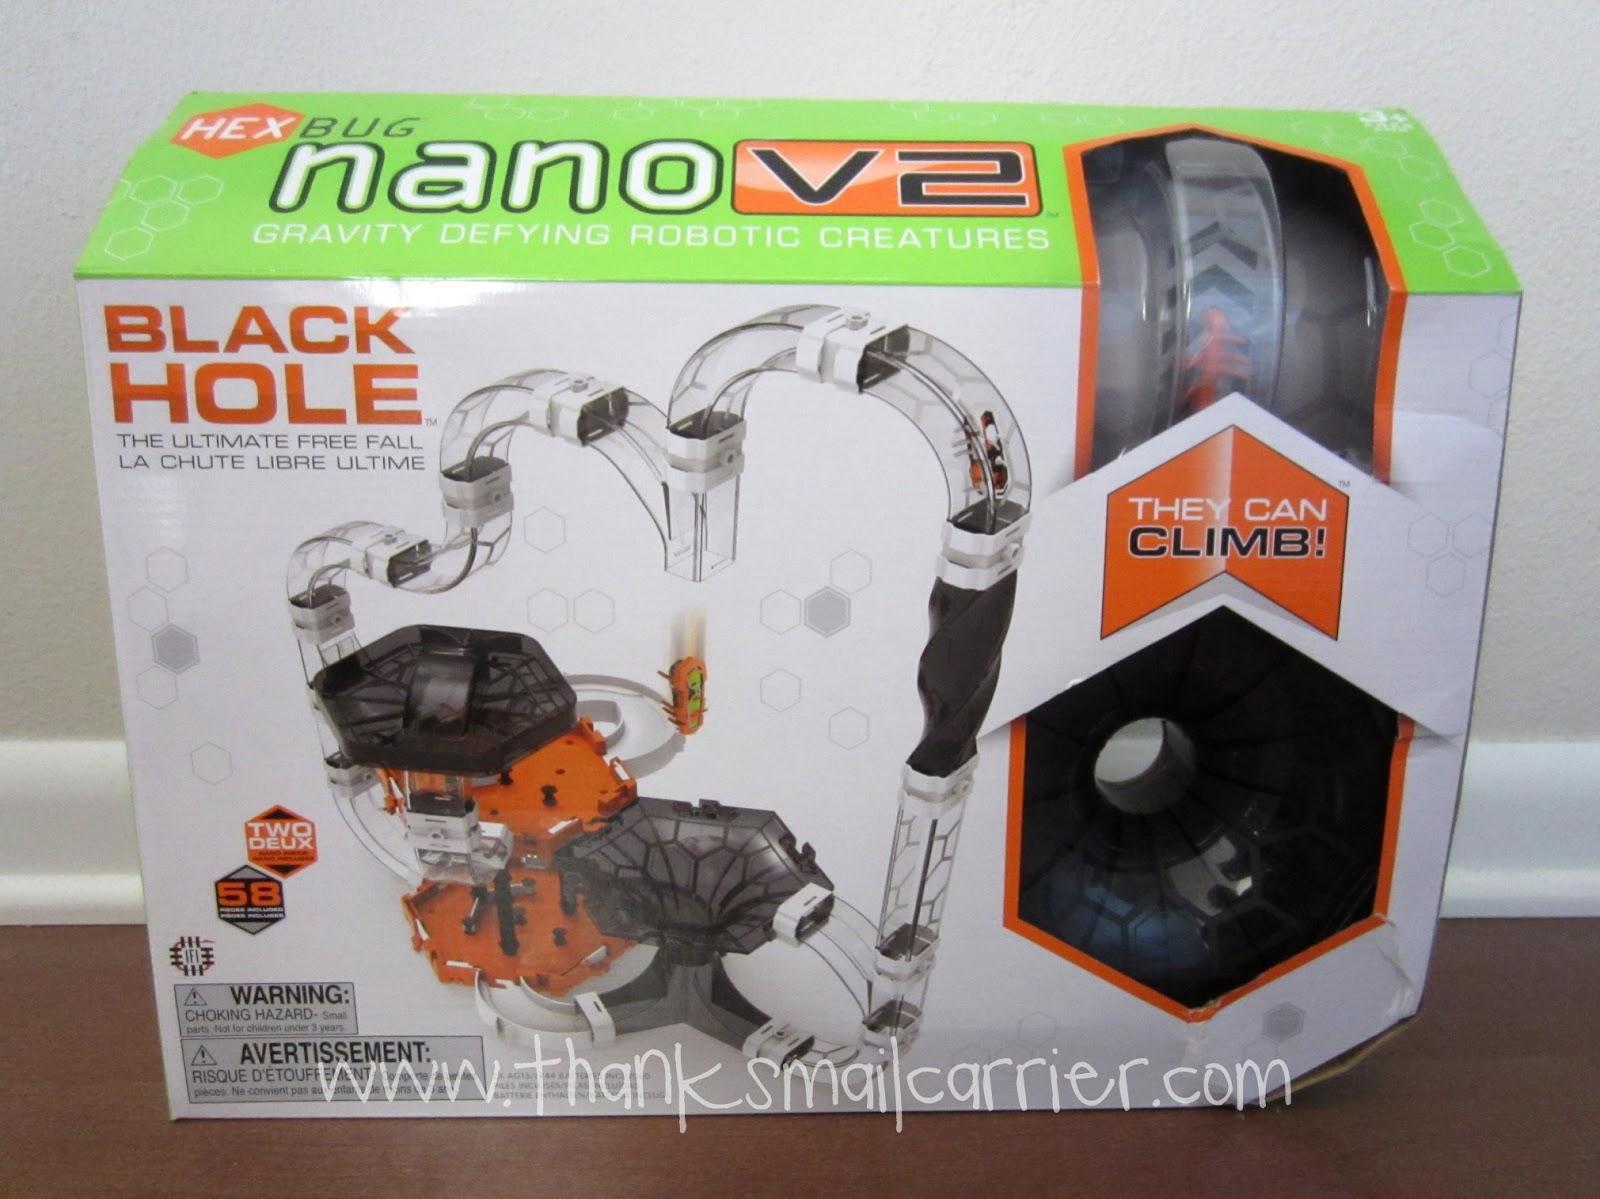 hexbug nano v2 black hole-#3